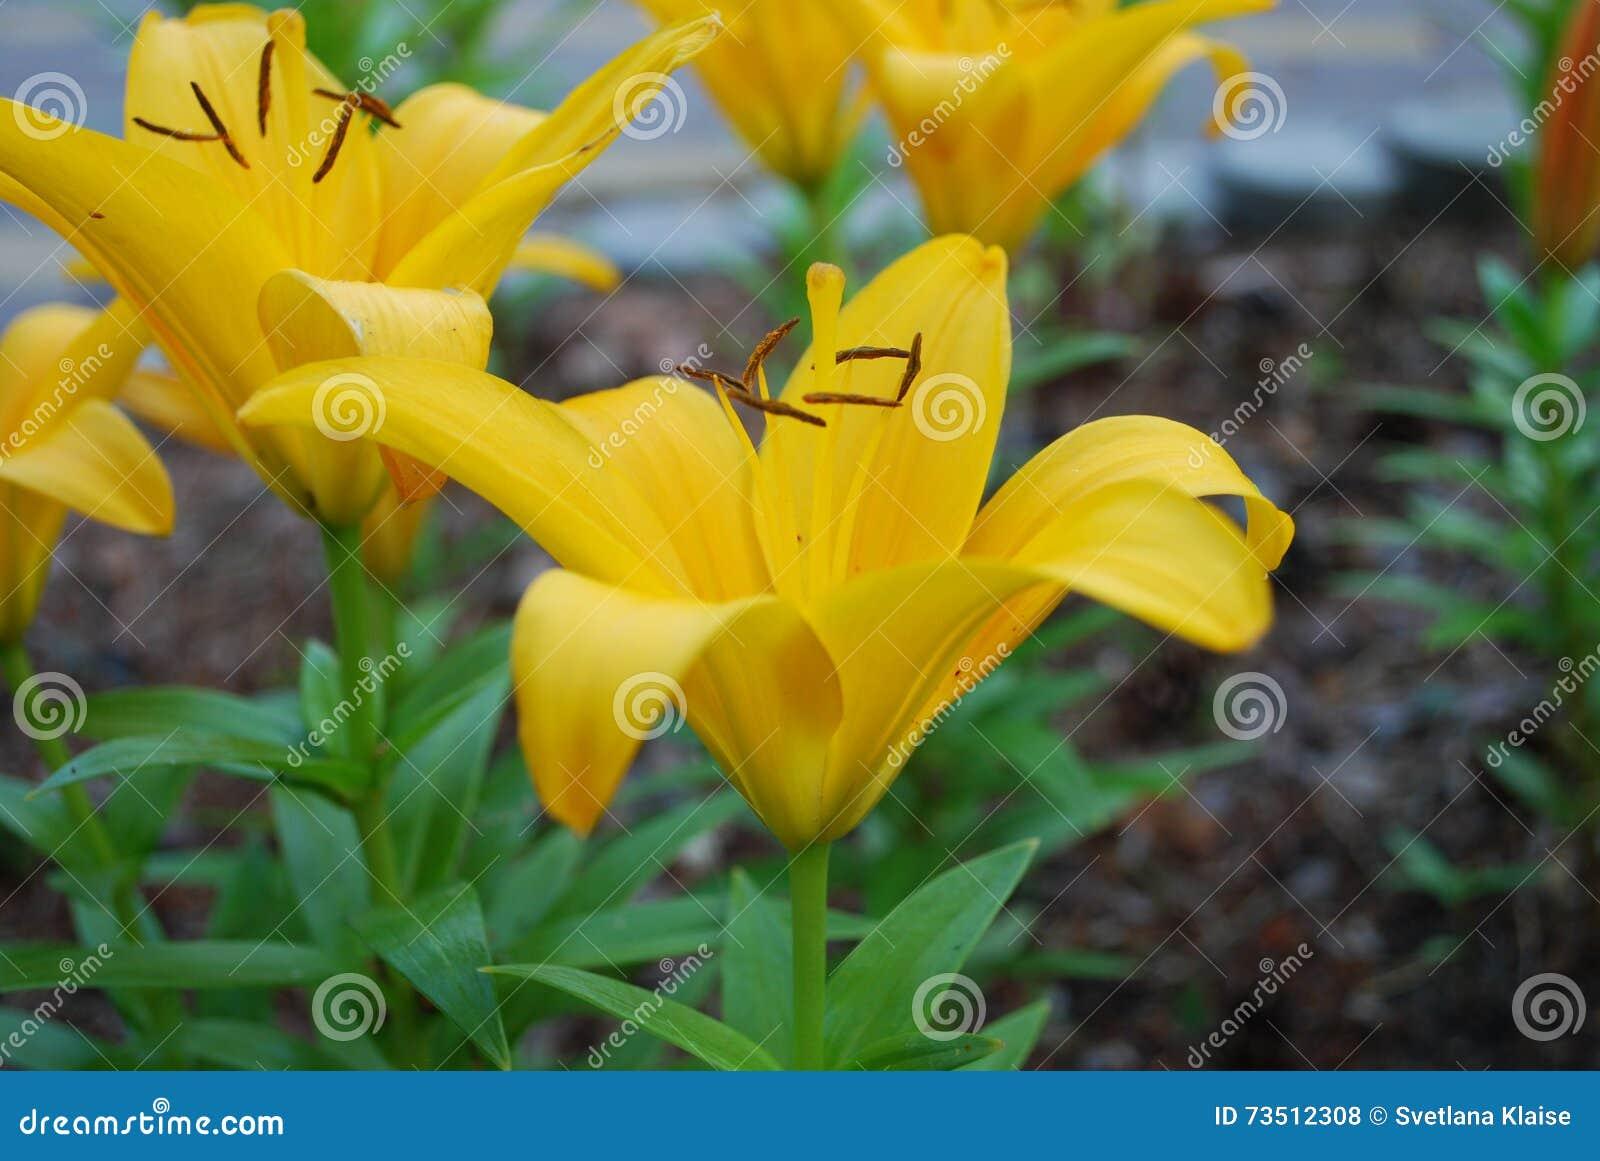 Lilium Asiatic Yellow Flower Stock Photo Image Of Background